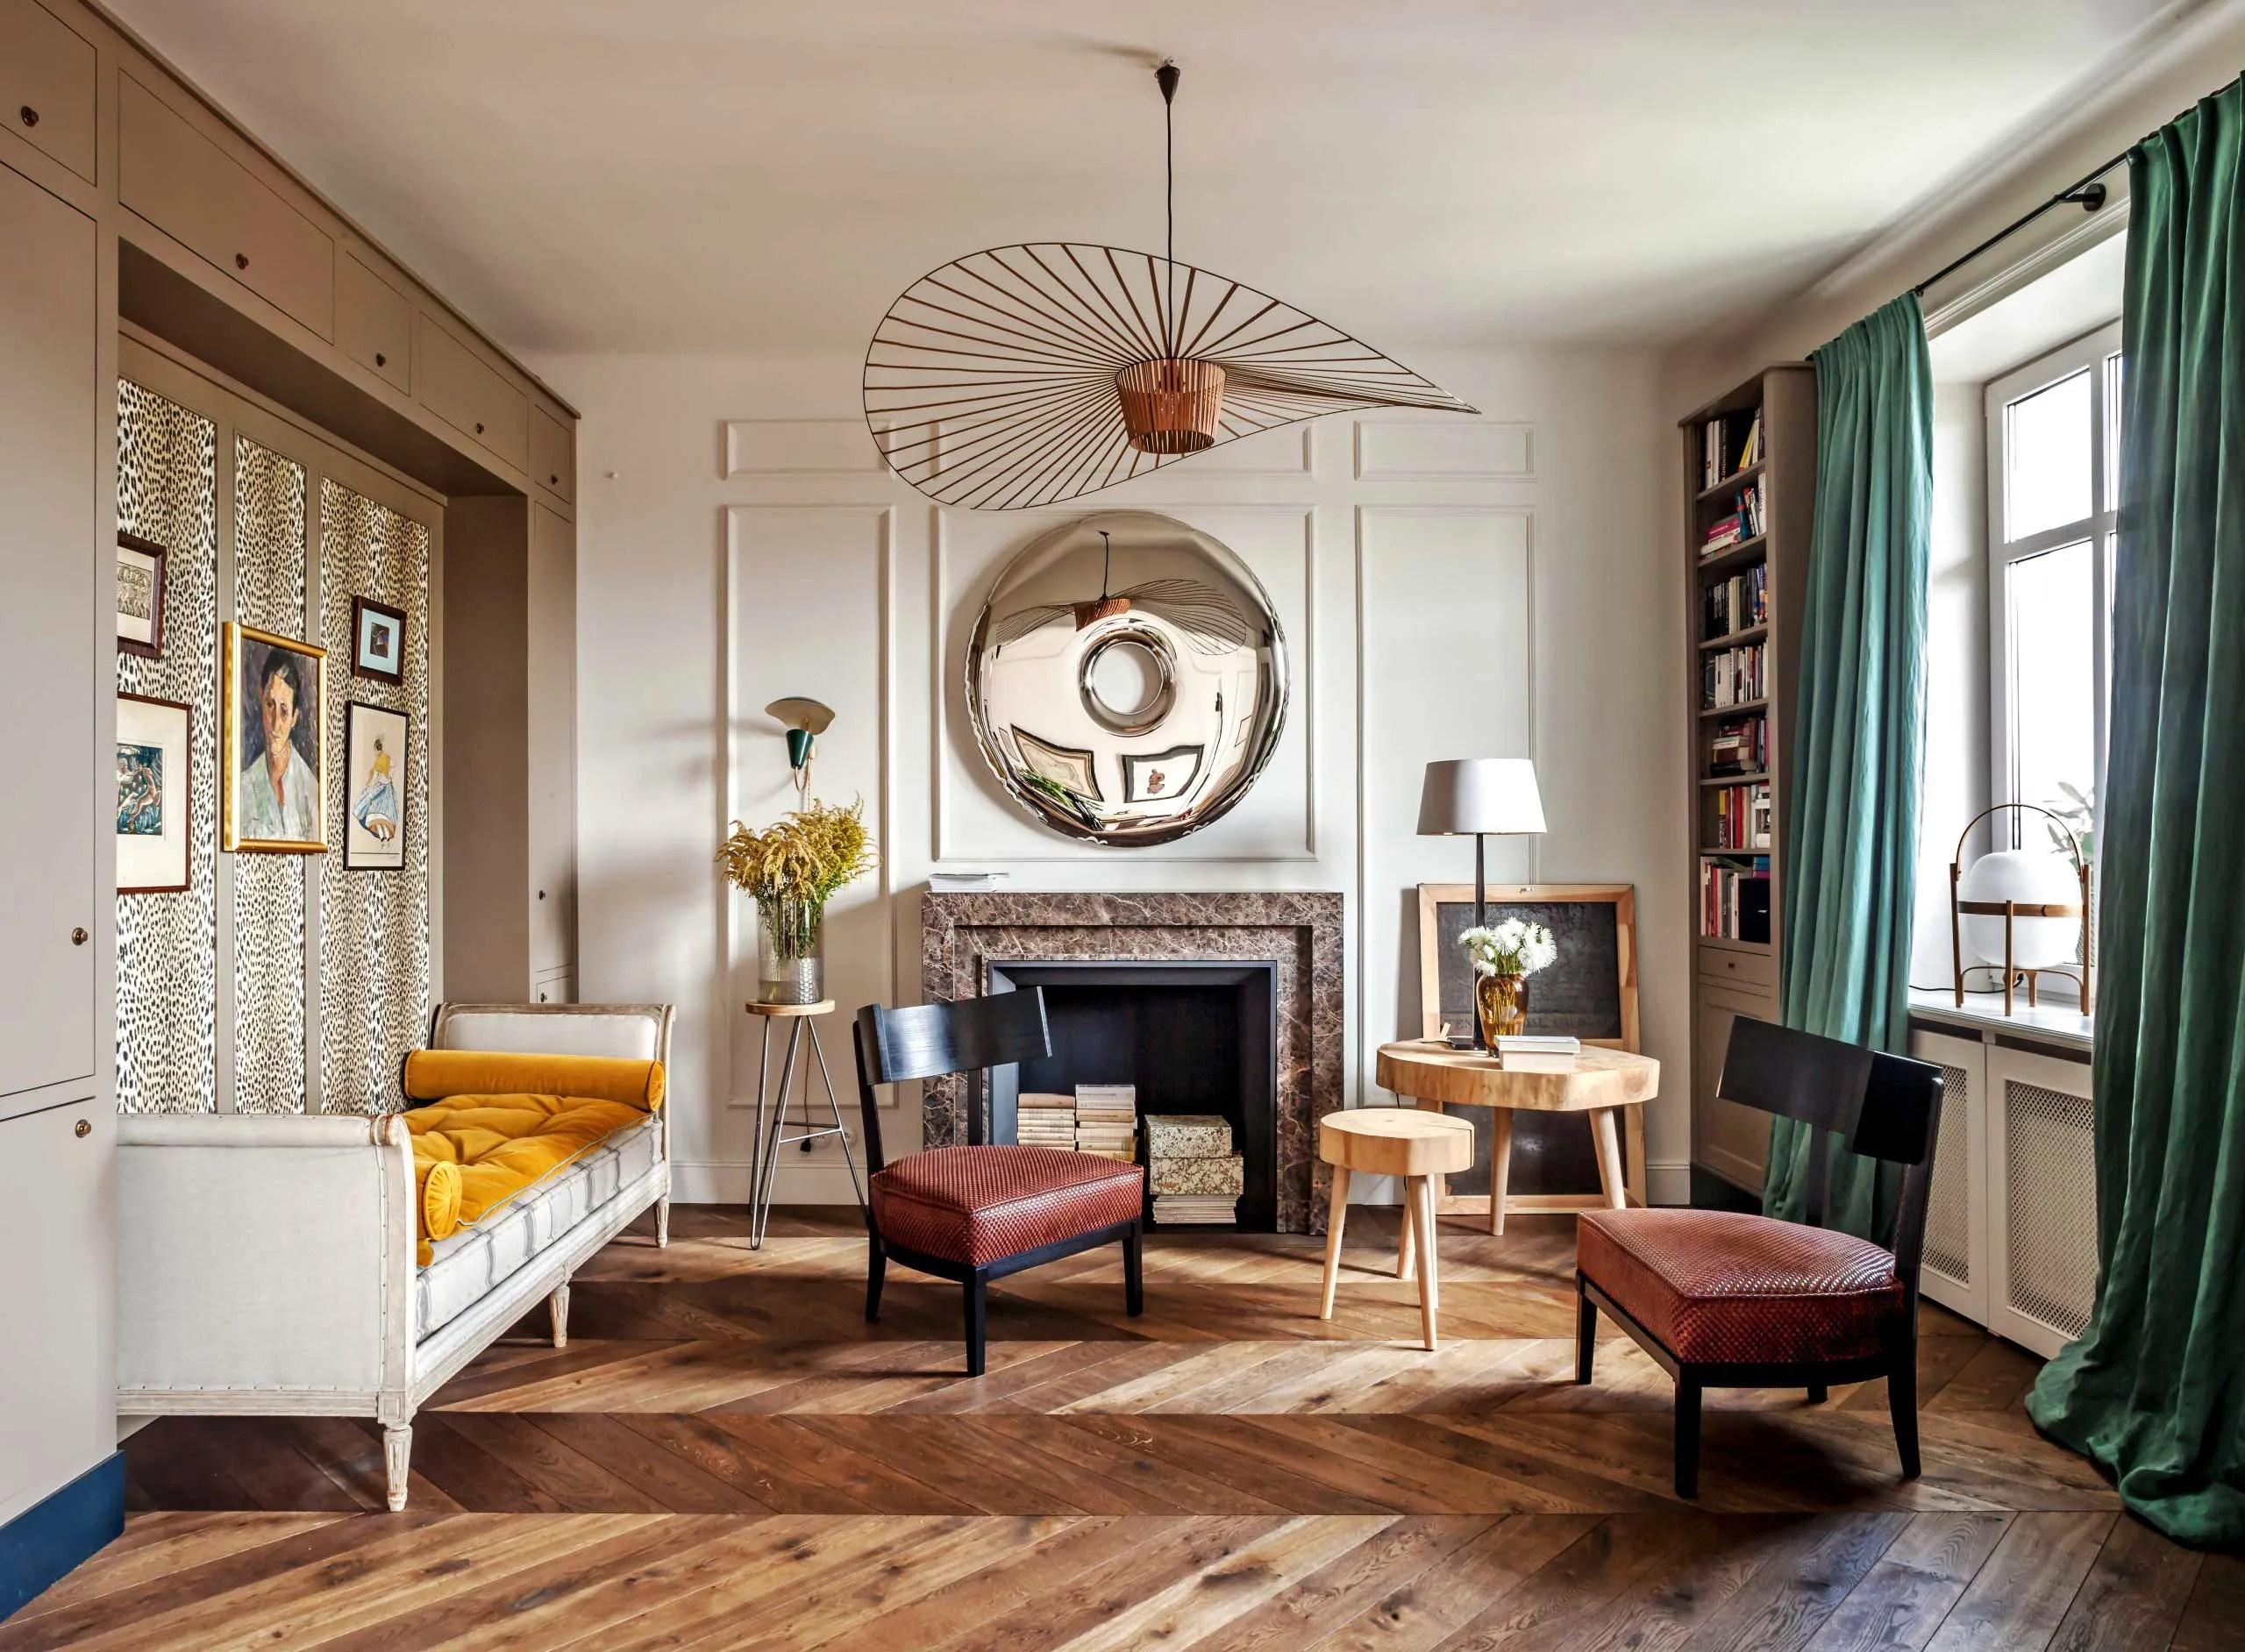 Prewar Apartment  Modern French Decor Inspiration  Architectural Digest